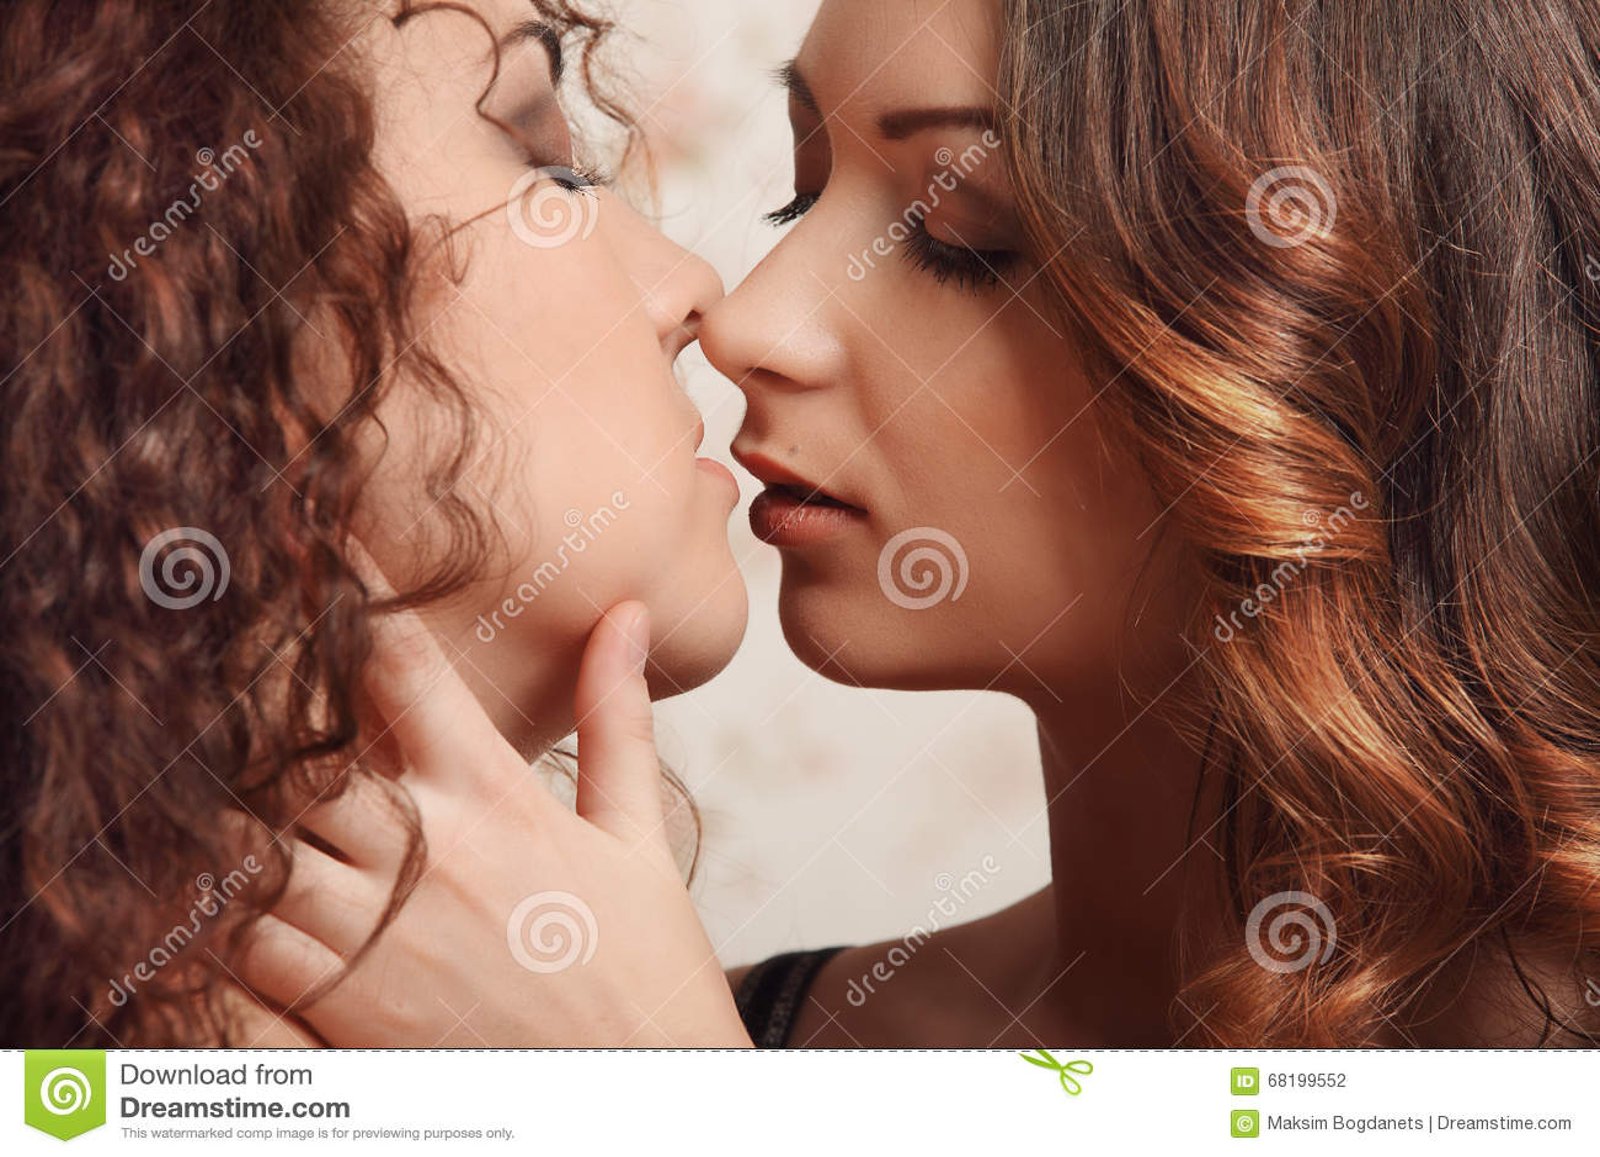 caldo lesbiche mamme baci